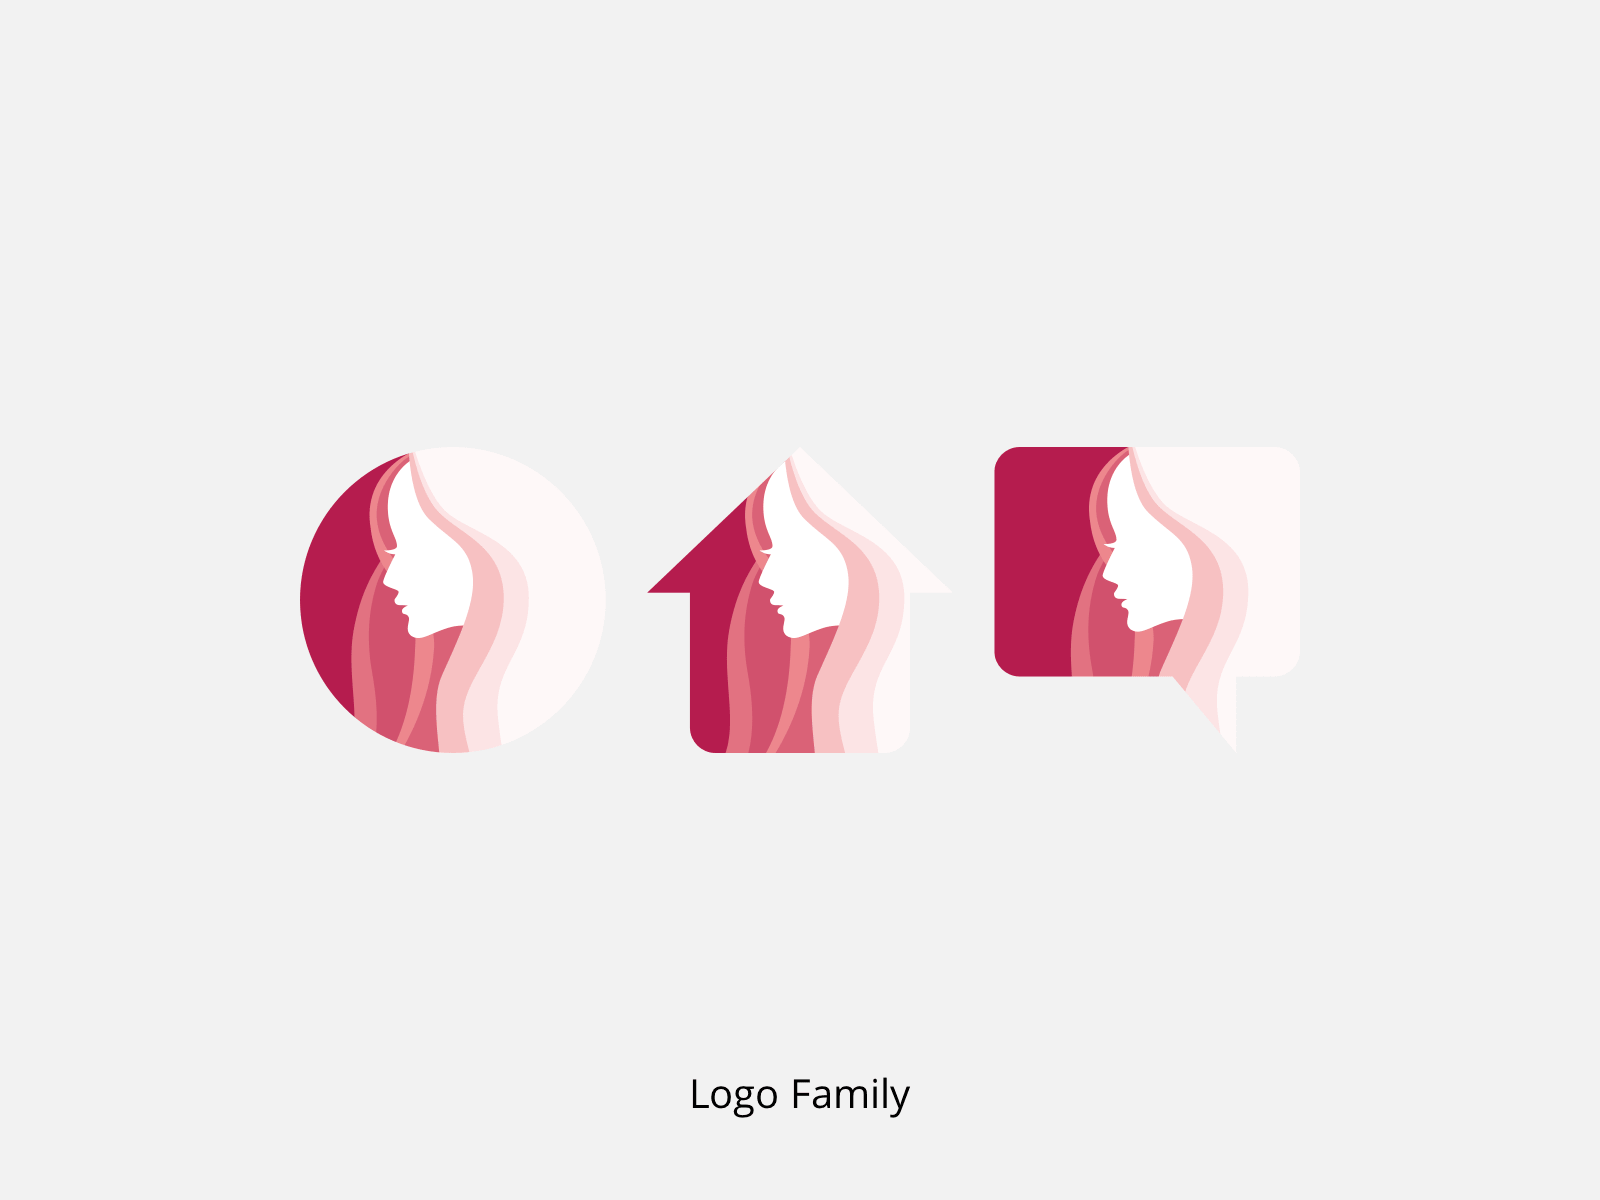 <p>Logo Family</p>